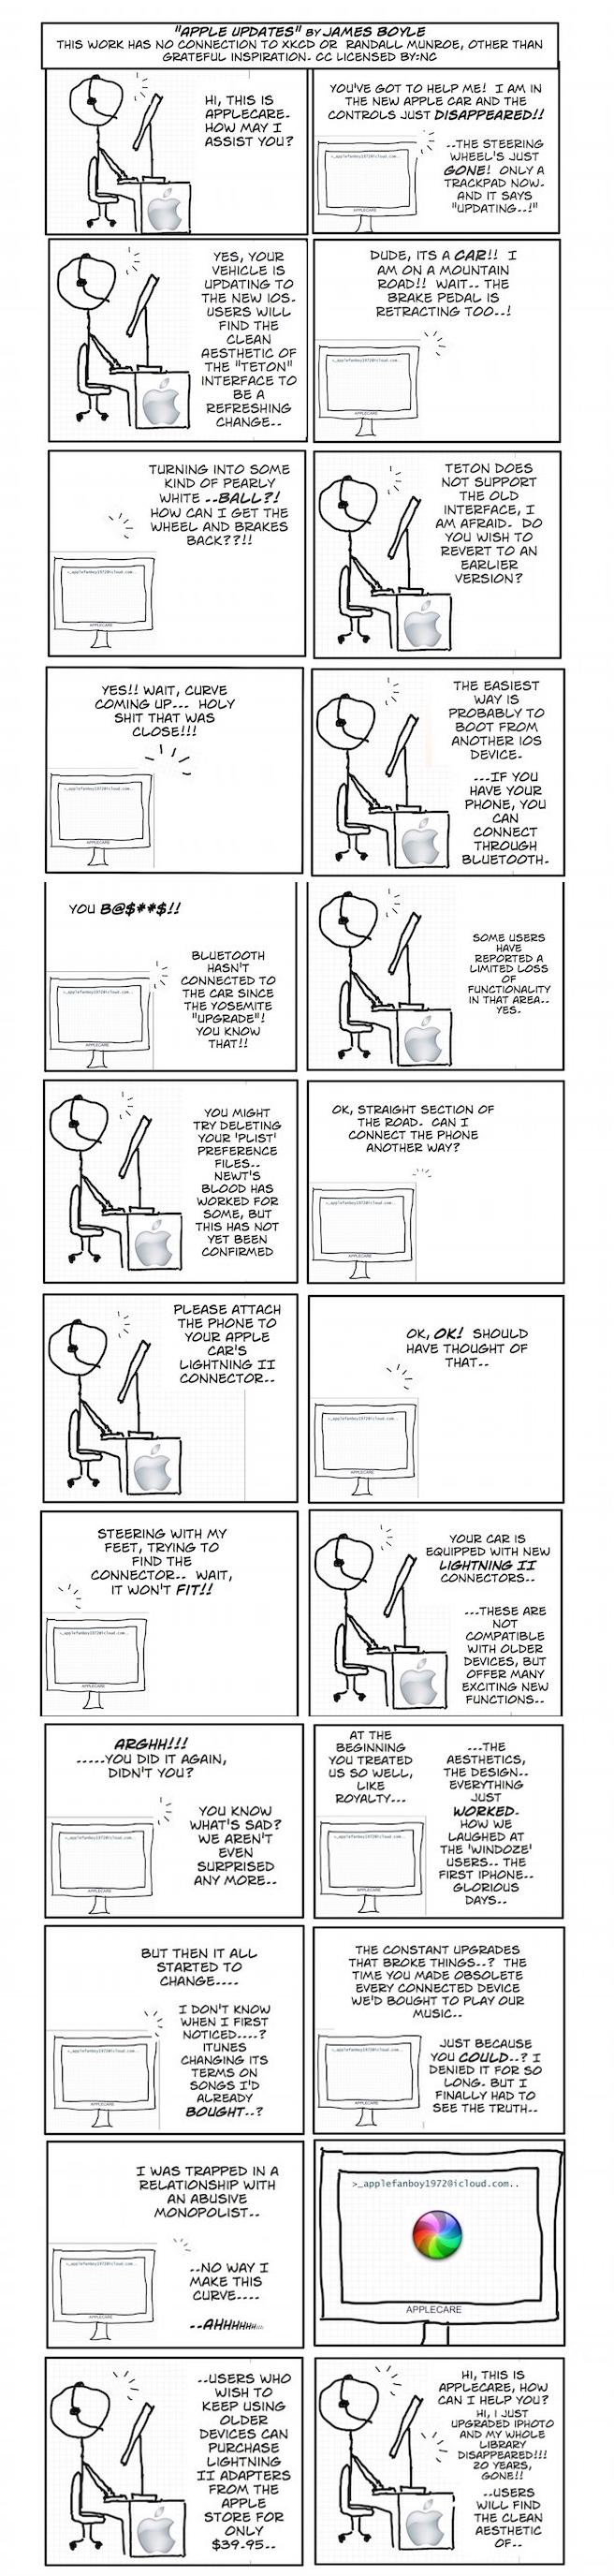 apple comic